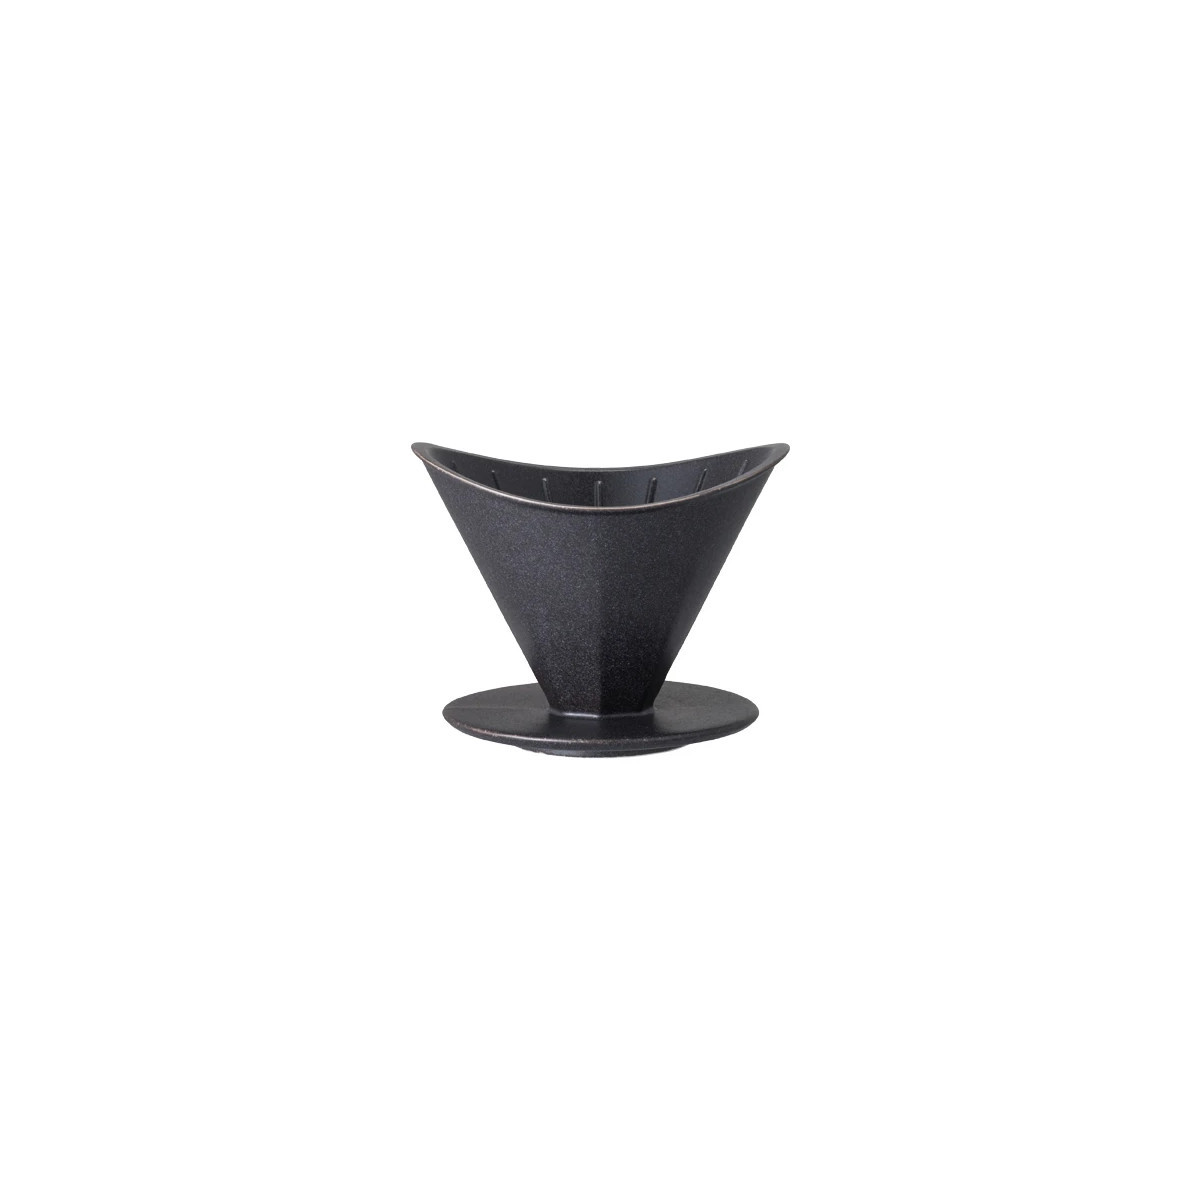 Porcelanowy dripper do kawy OCT brewer 2cups Kinto